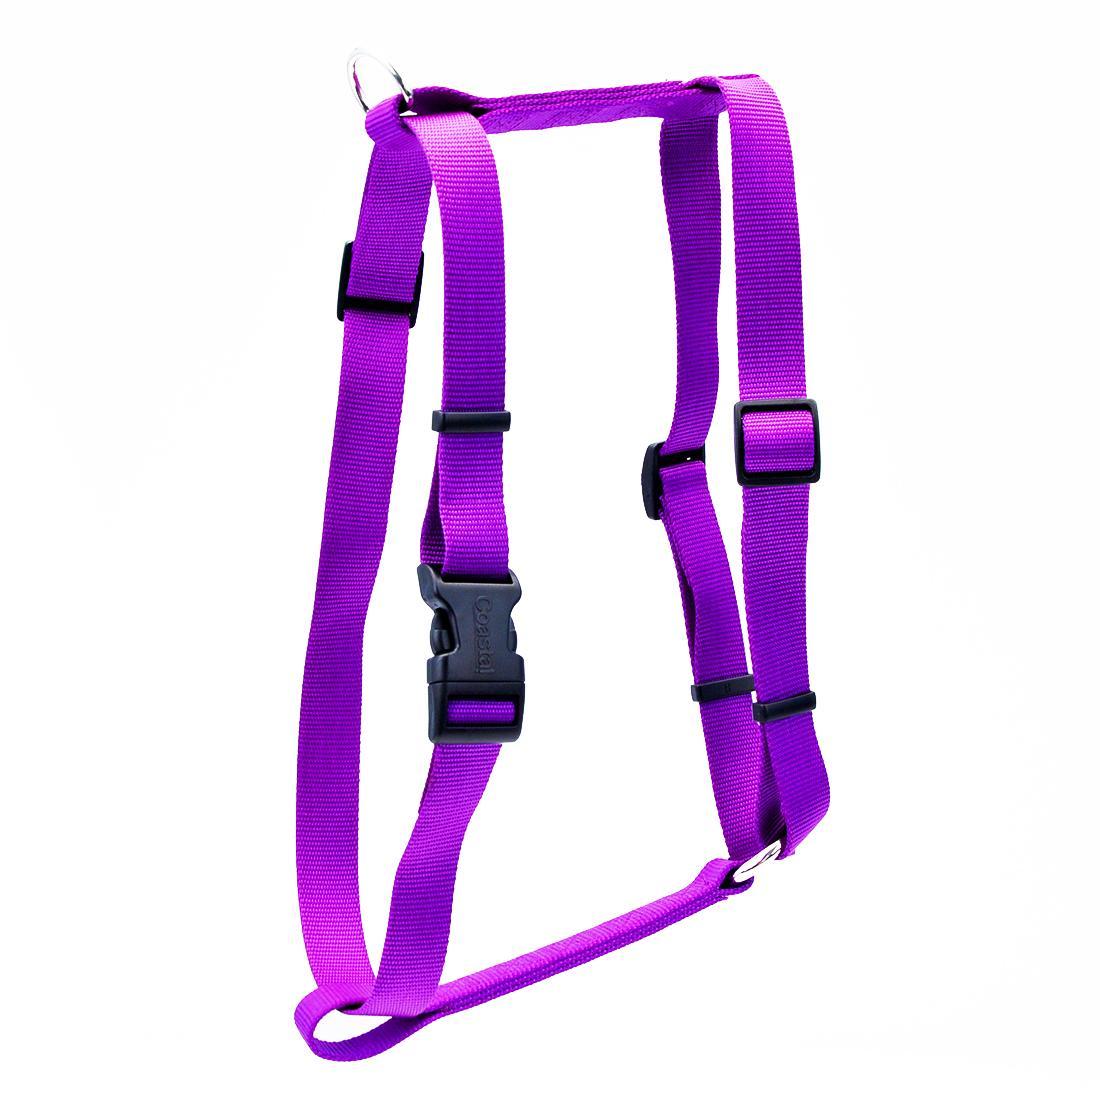 Coastal Standard Adjustable Dog Harness, Purple, 3/8-in x 10-18-in